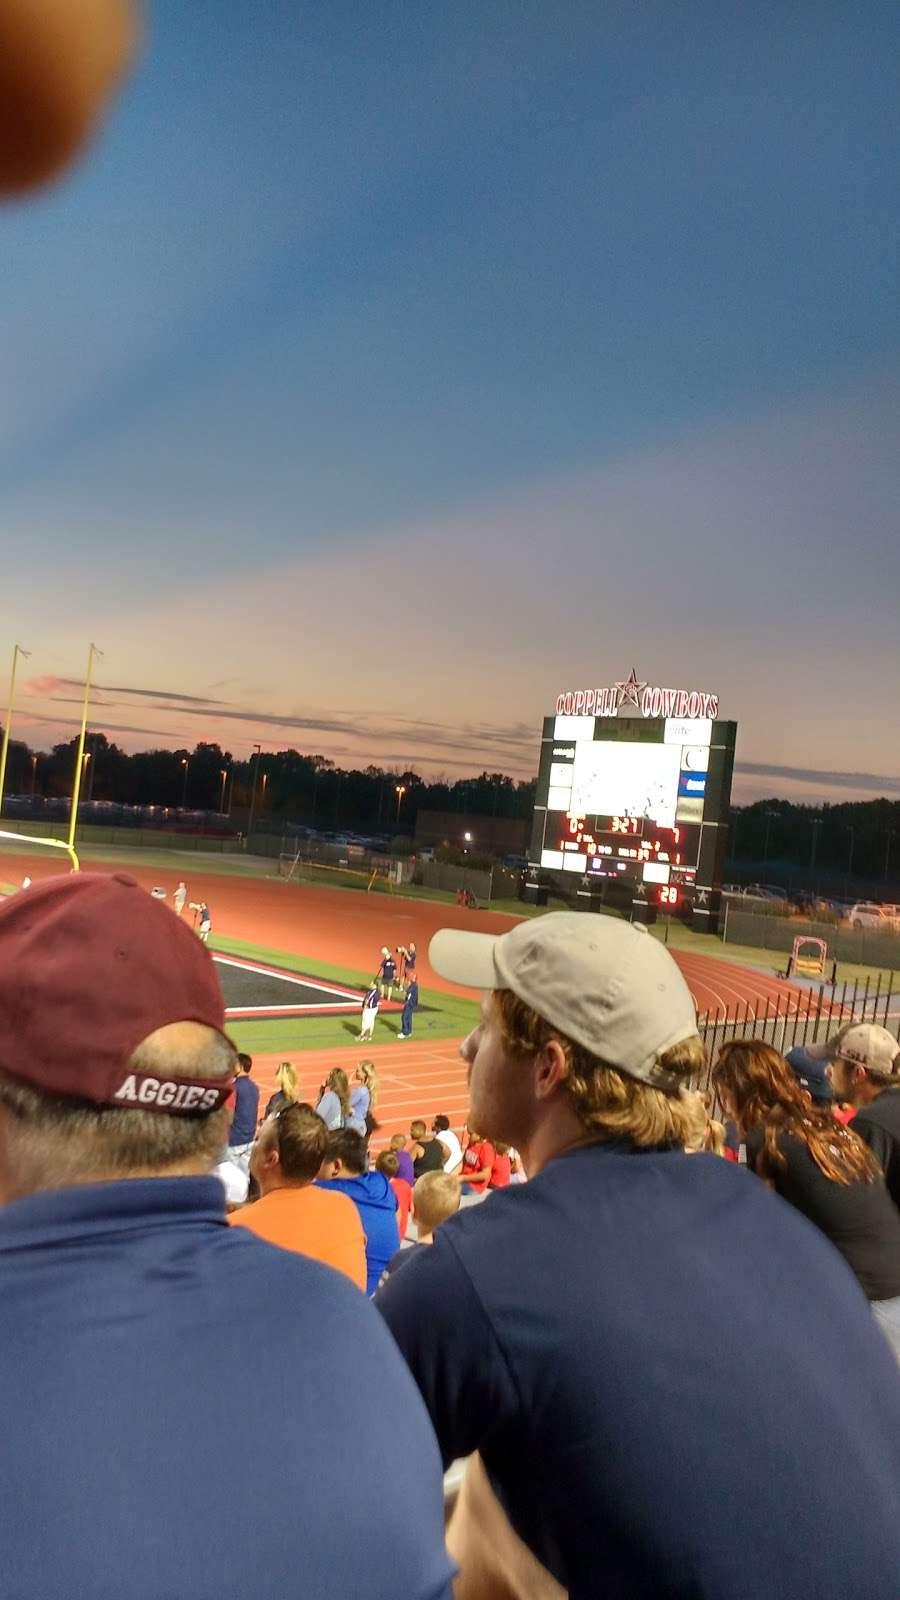 Buddy Echols Field - stadium    Photo 2 of 10   Address: 185 W Parkway Blvd, Coppell, TX 75019, USA   Phone: (214) 496-6100